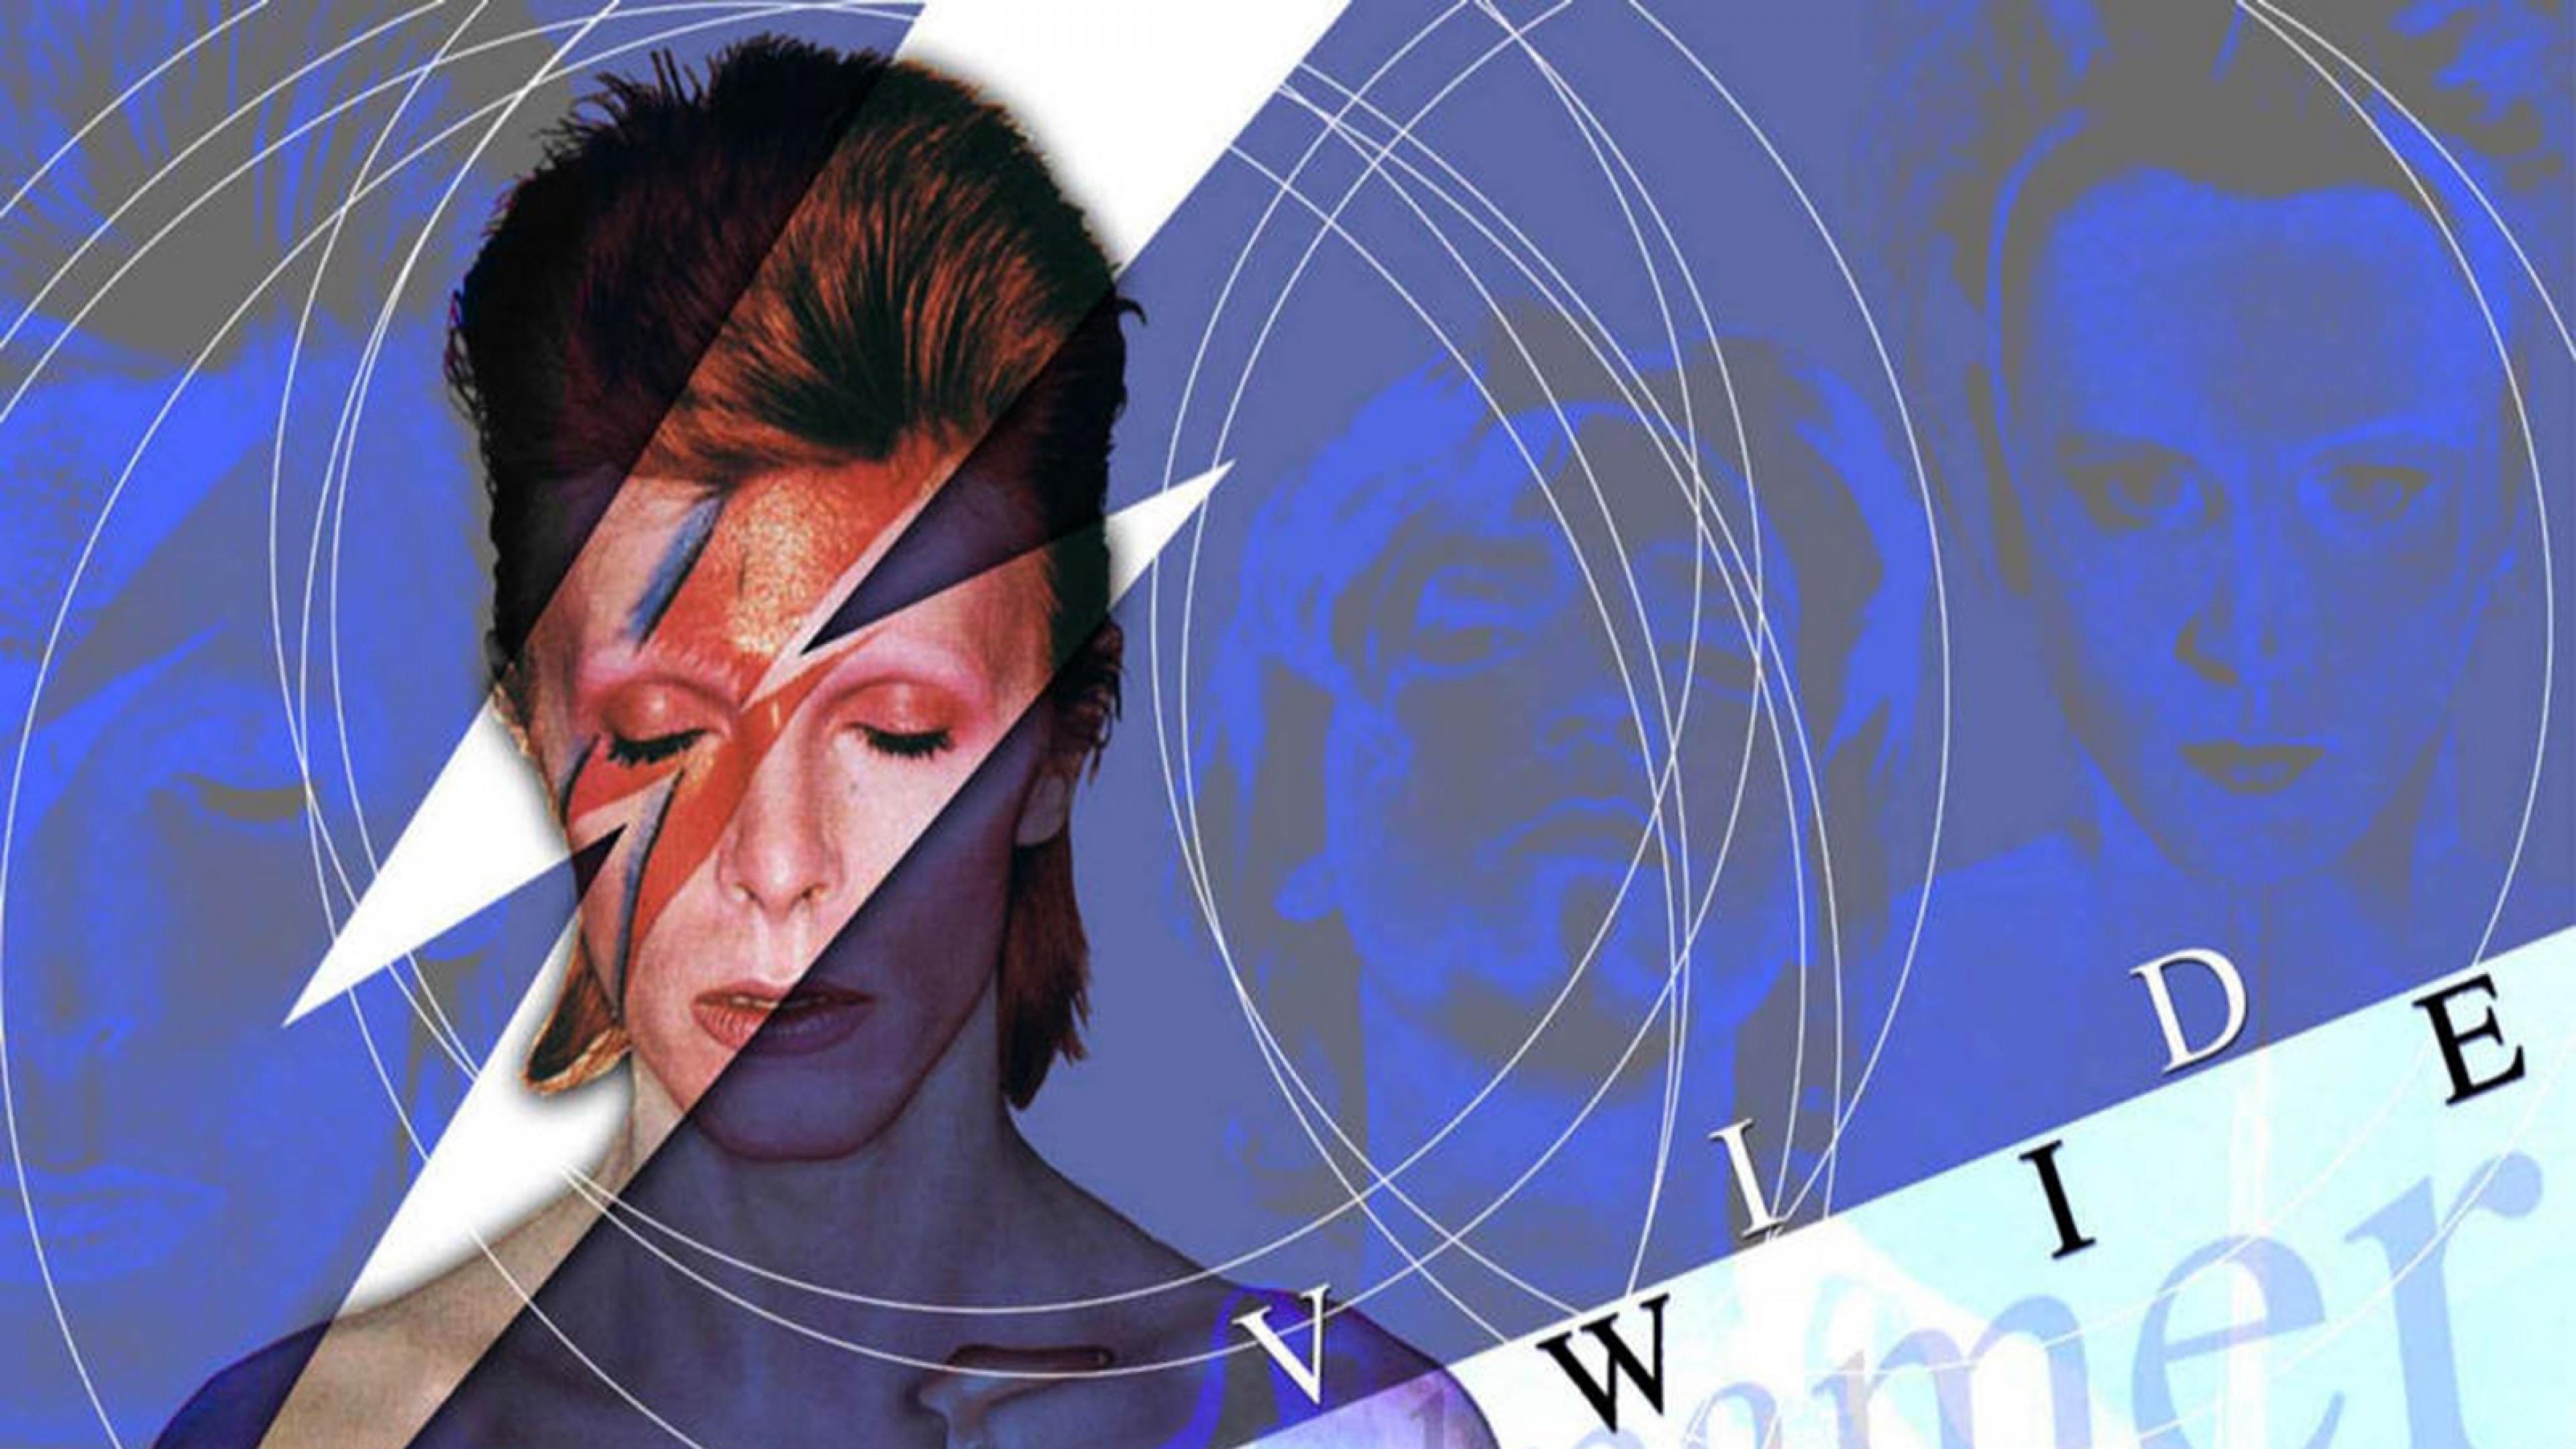 Inspirational Quotes Computer Wallpaper David Bowie Wallpaper For Desktop Pixelstalk Net